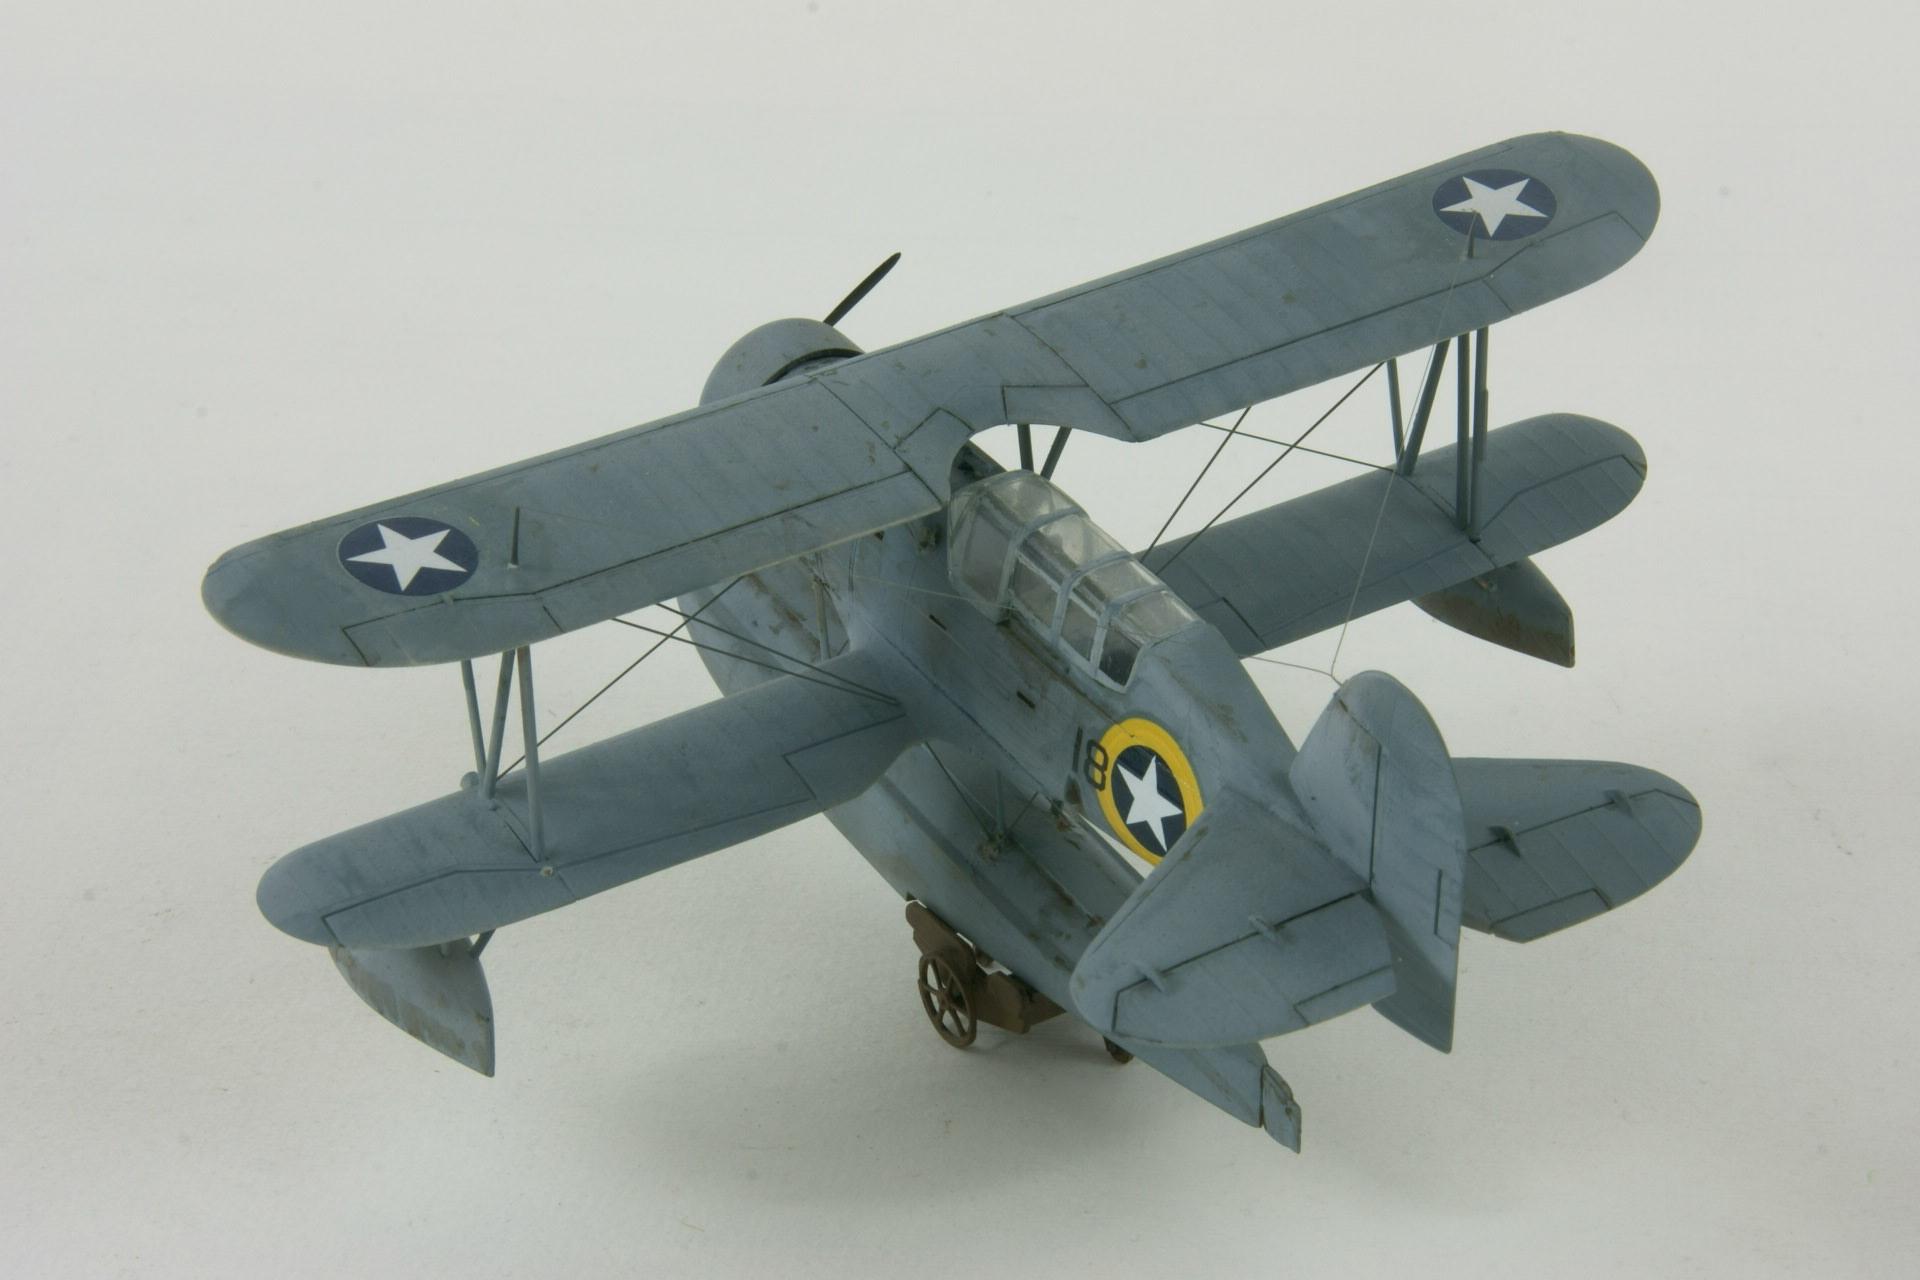 Curtiss soc 2 seagull 2 2